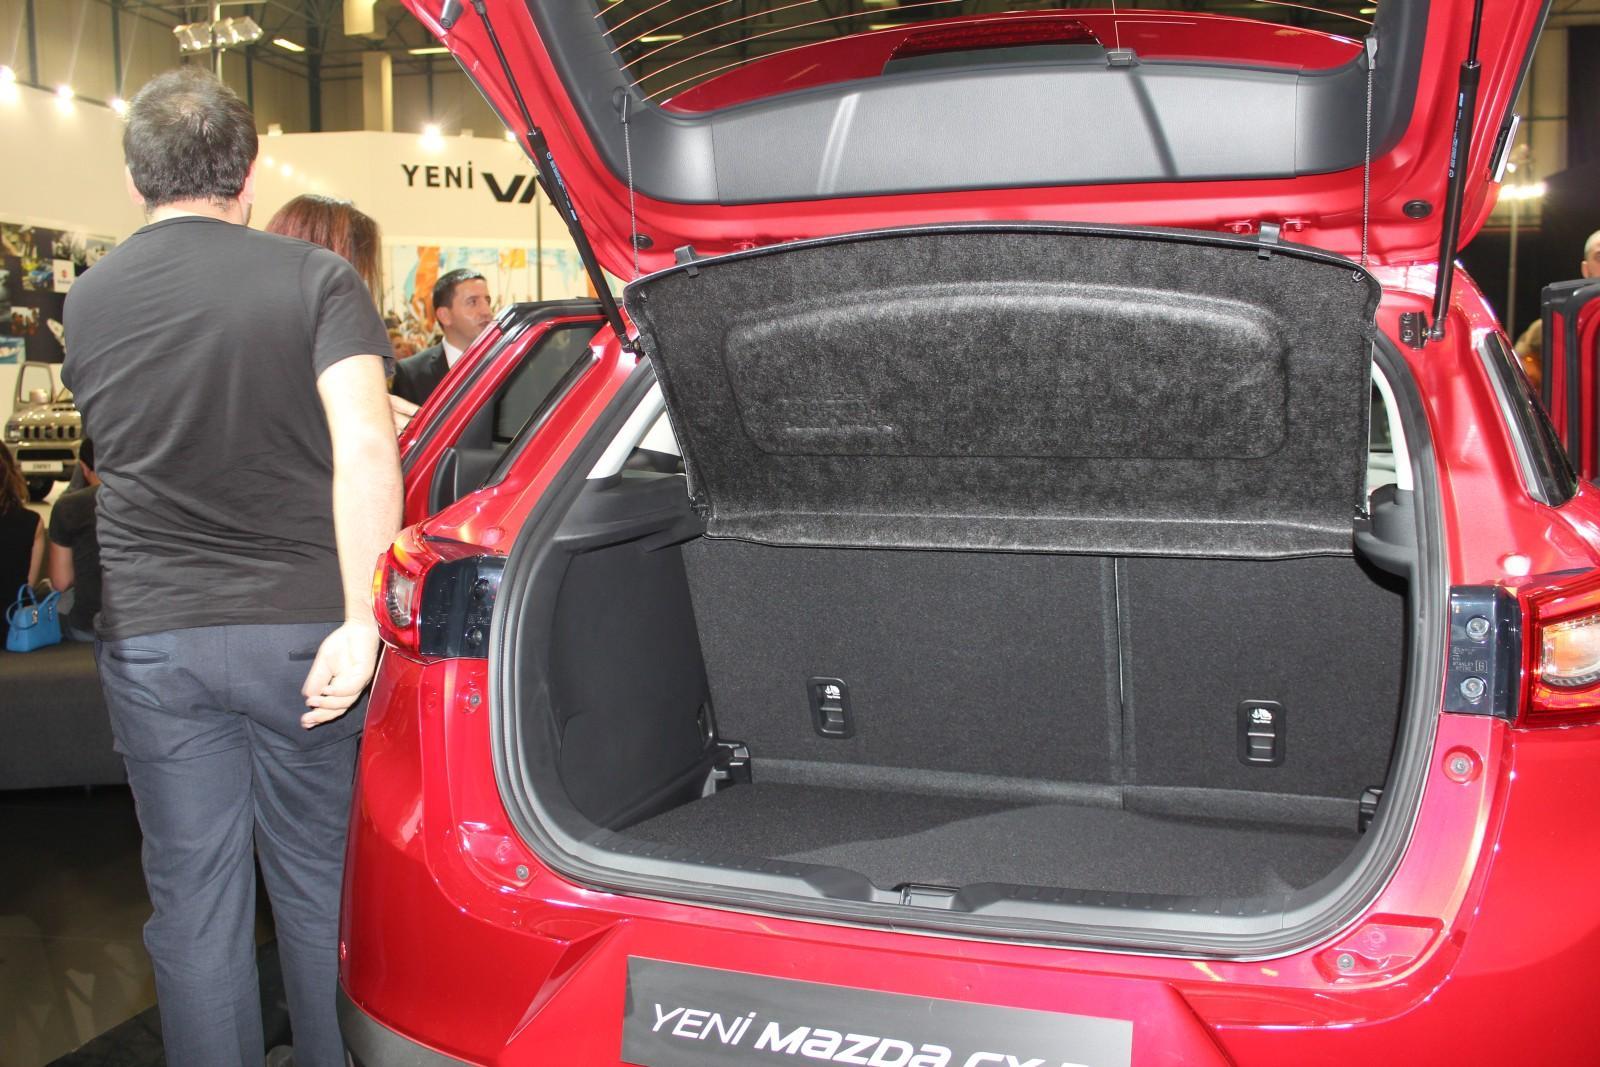 MazdaClubTR_IstanbulAutoshow2015-043.jpg